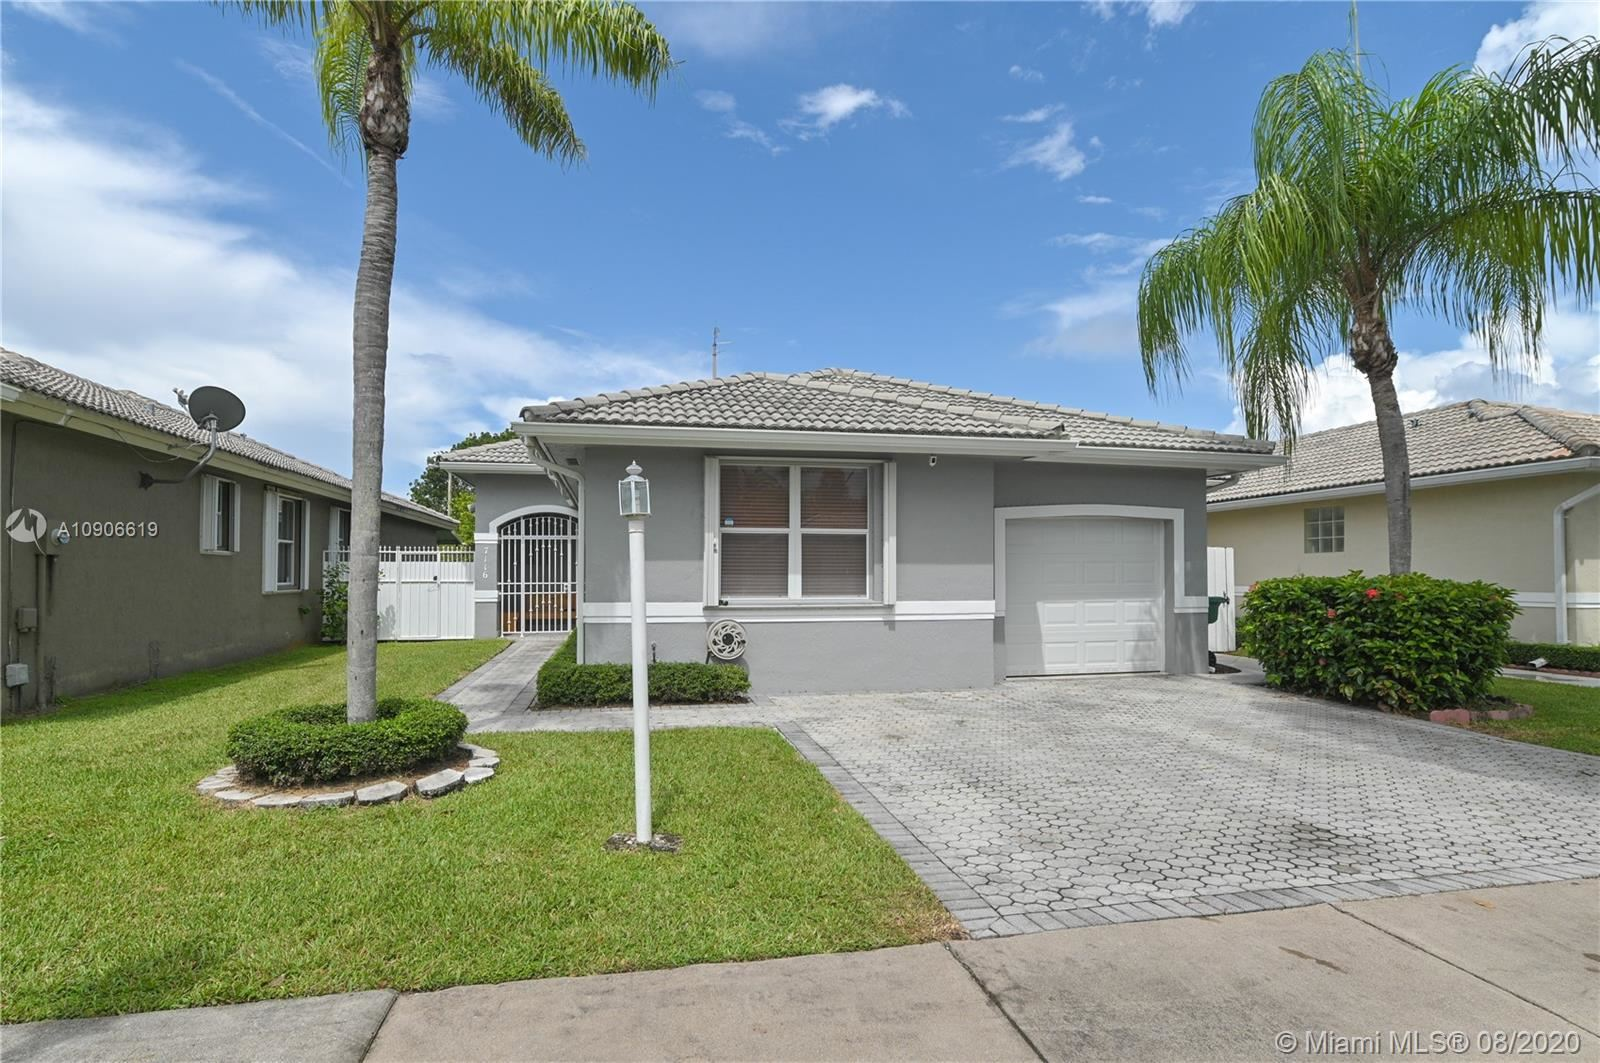 7116 SW 161st Pl, Miami, FL 33193 - #: A10906619